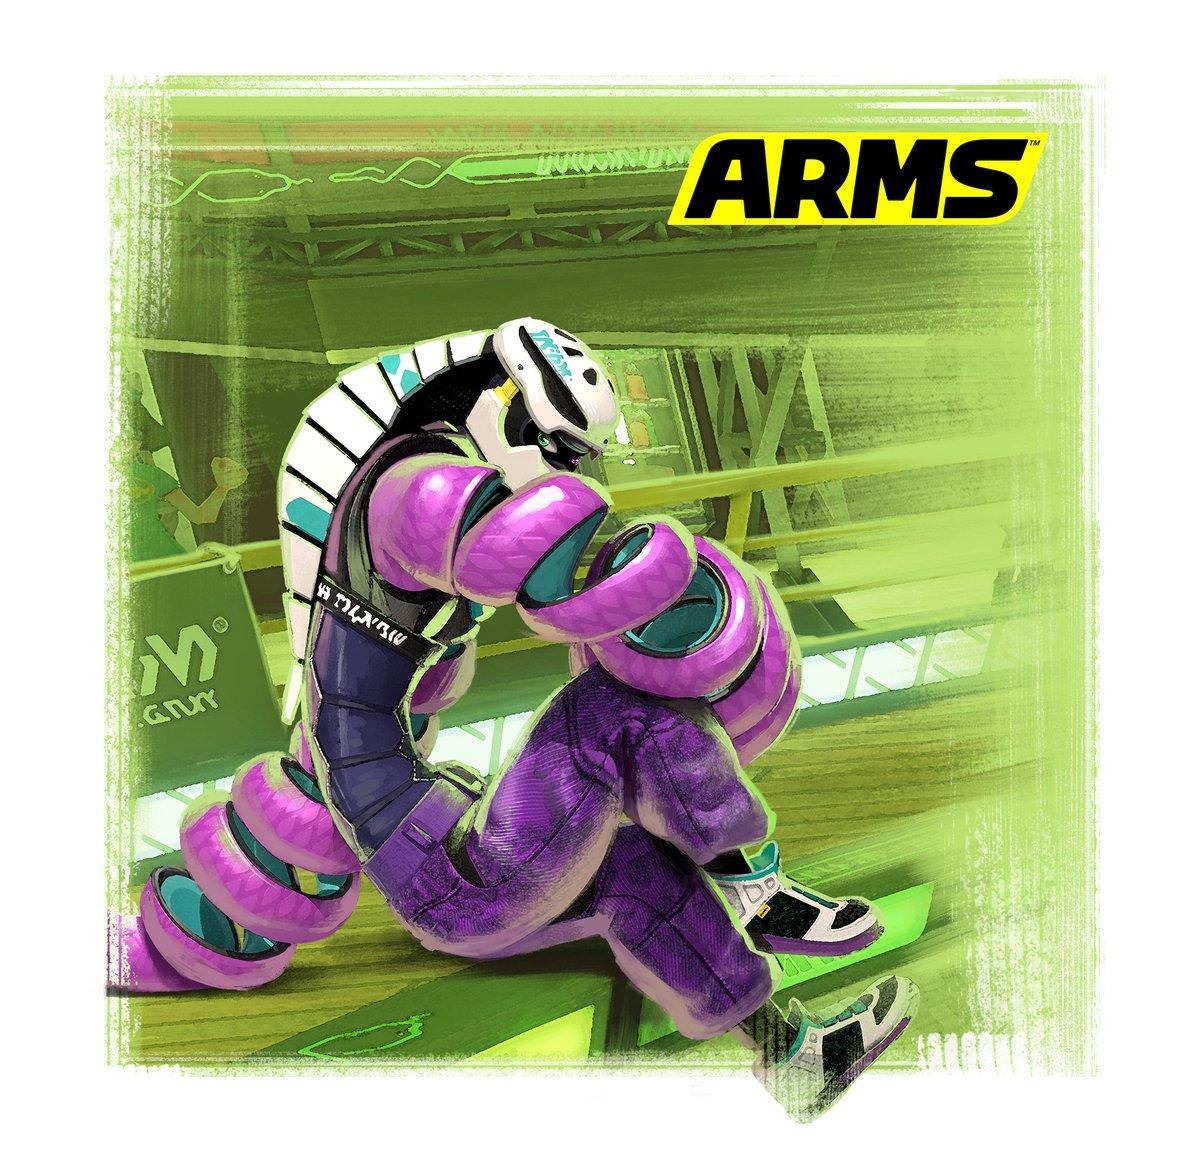 『ARMS』の更新データVer. 2.1.0が8月9日から配信開始!